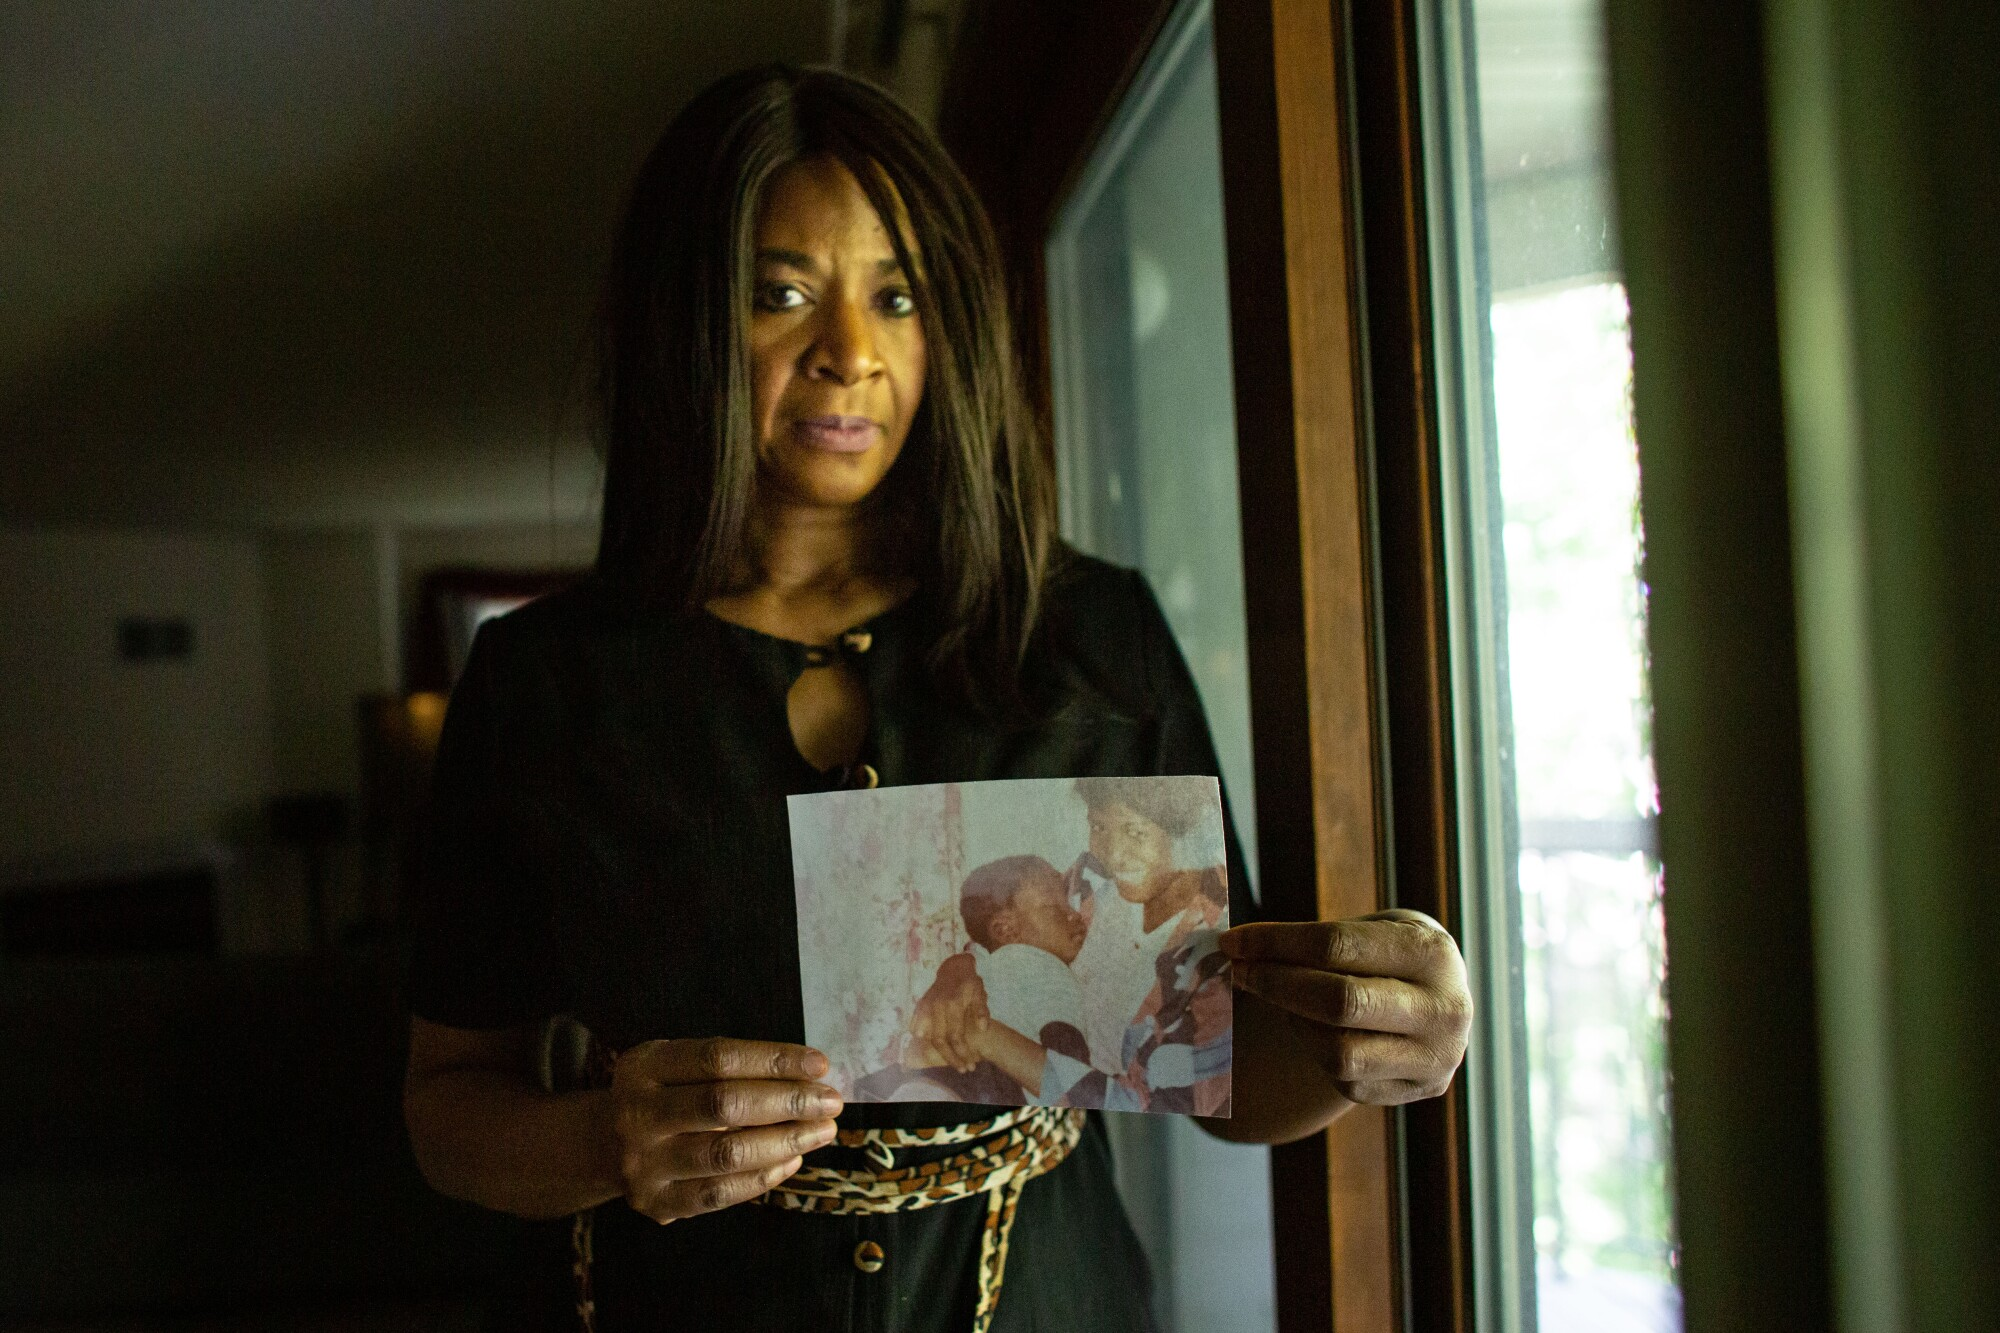 Angela Harrelson of Eagan, Minn., holds a photo George Floyd as a baby.